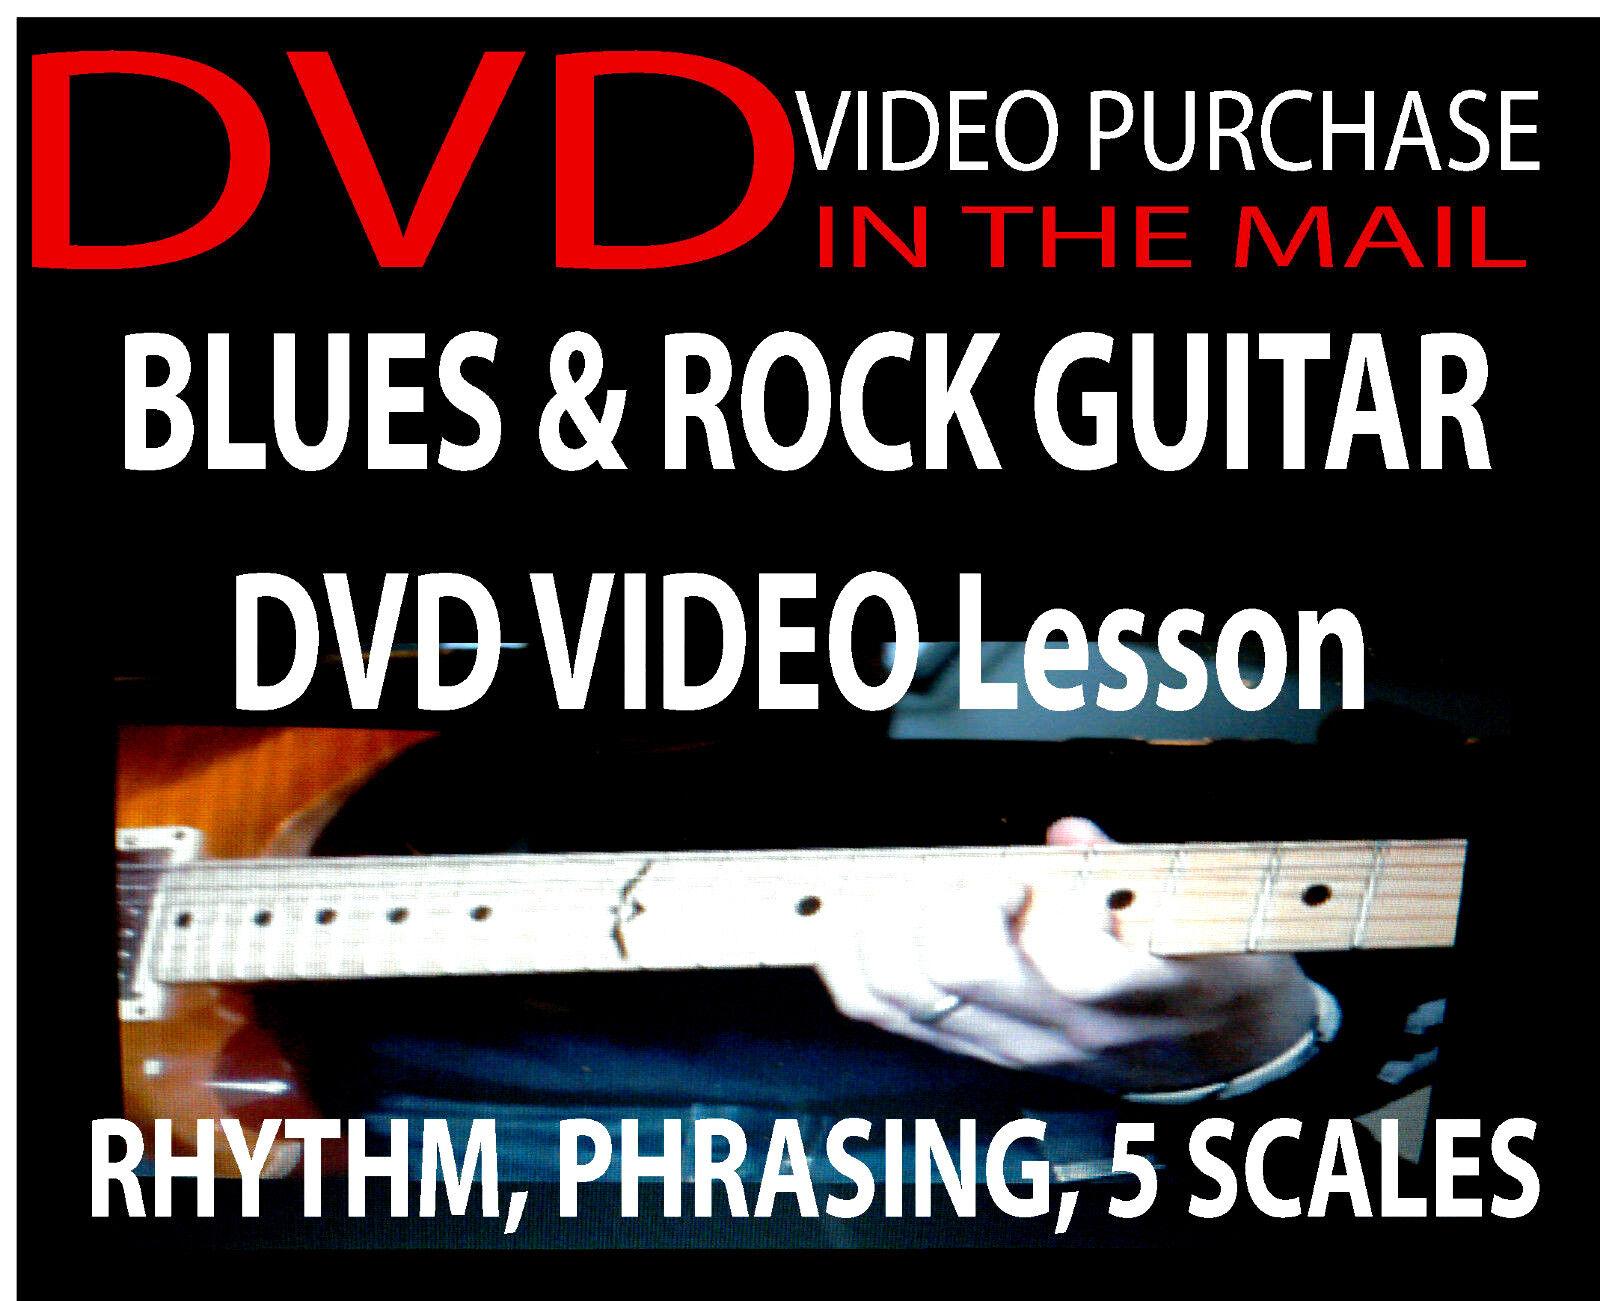 beginner rock guitar lesson dvd rock blues pentatonic scale for guitarists. Black Bedroom Furniture Sets. Home Design Ideas